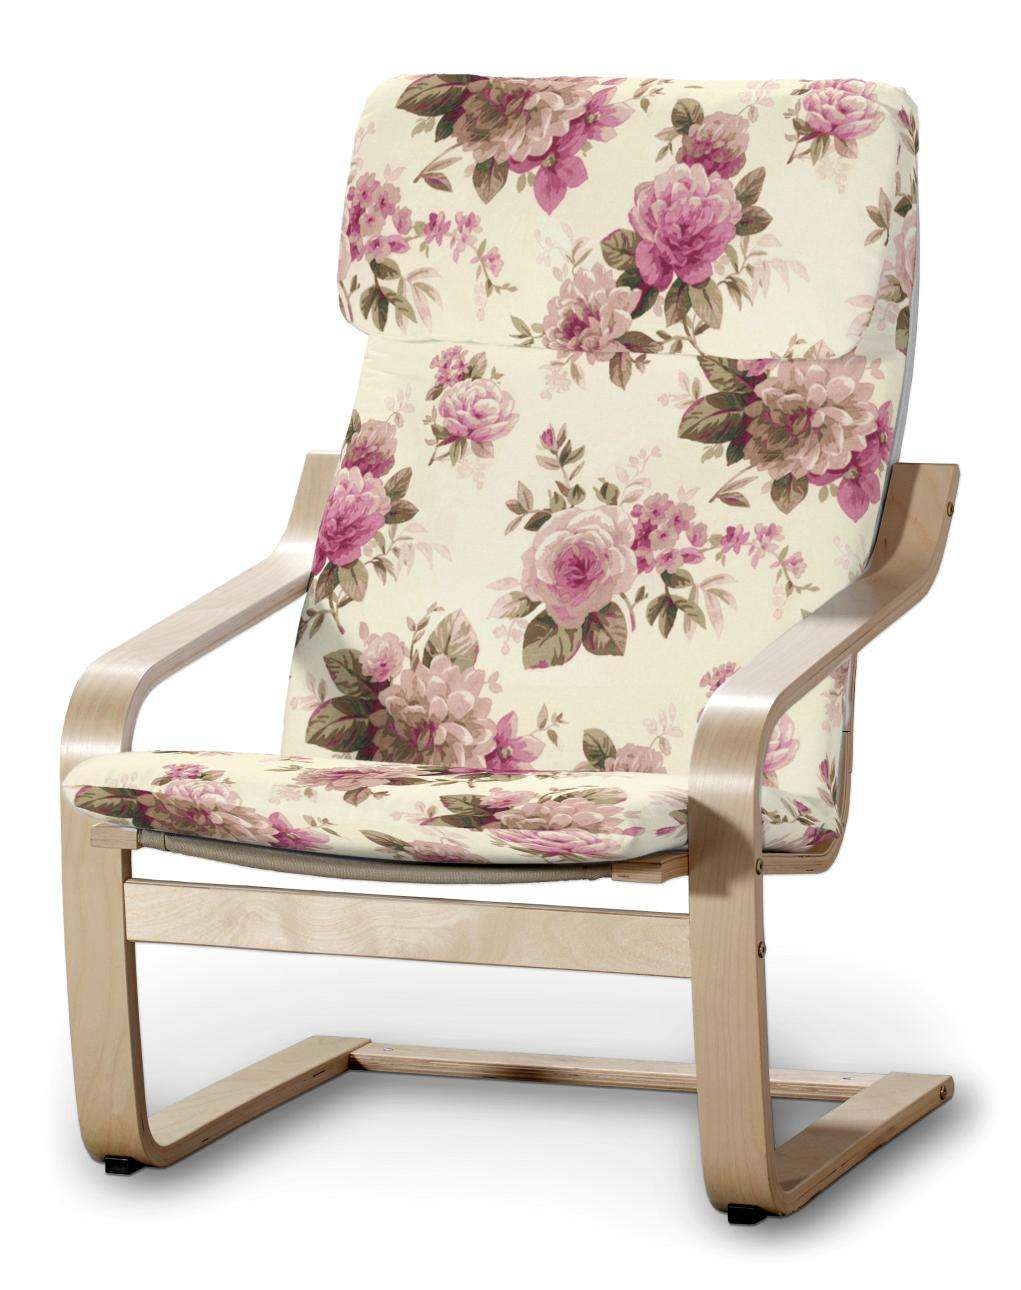 POÄNG  fotelio užvalkalas Poäng armchair kolekcijoje Mirella, audinys: 141-07